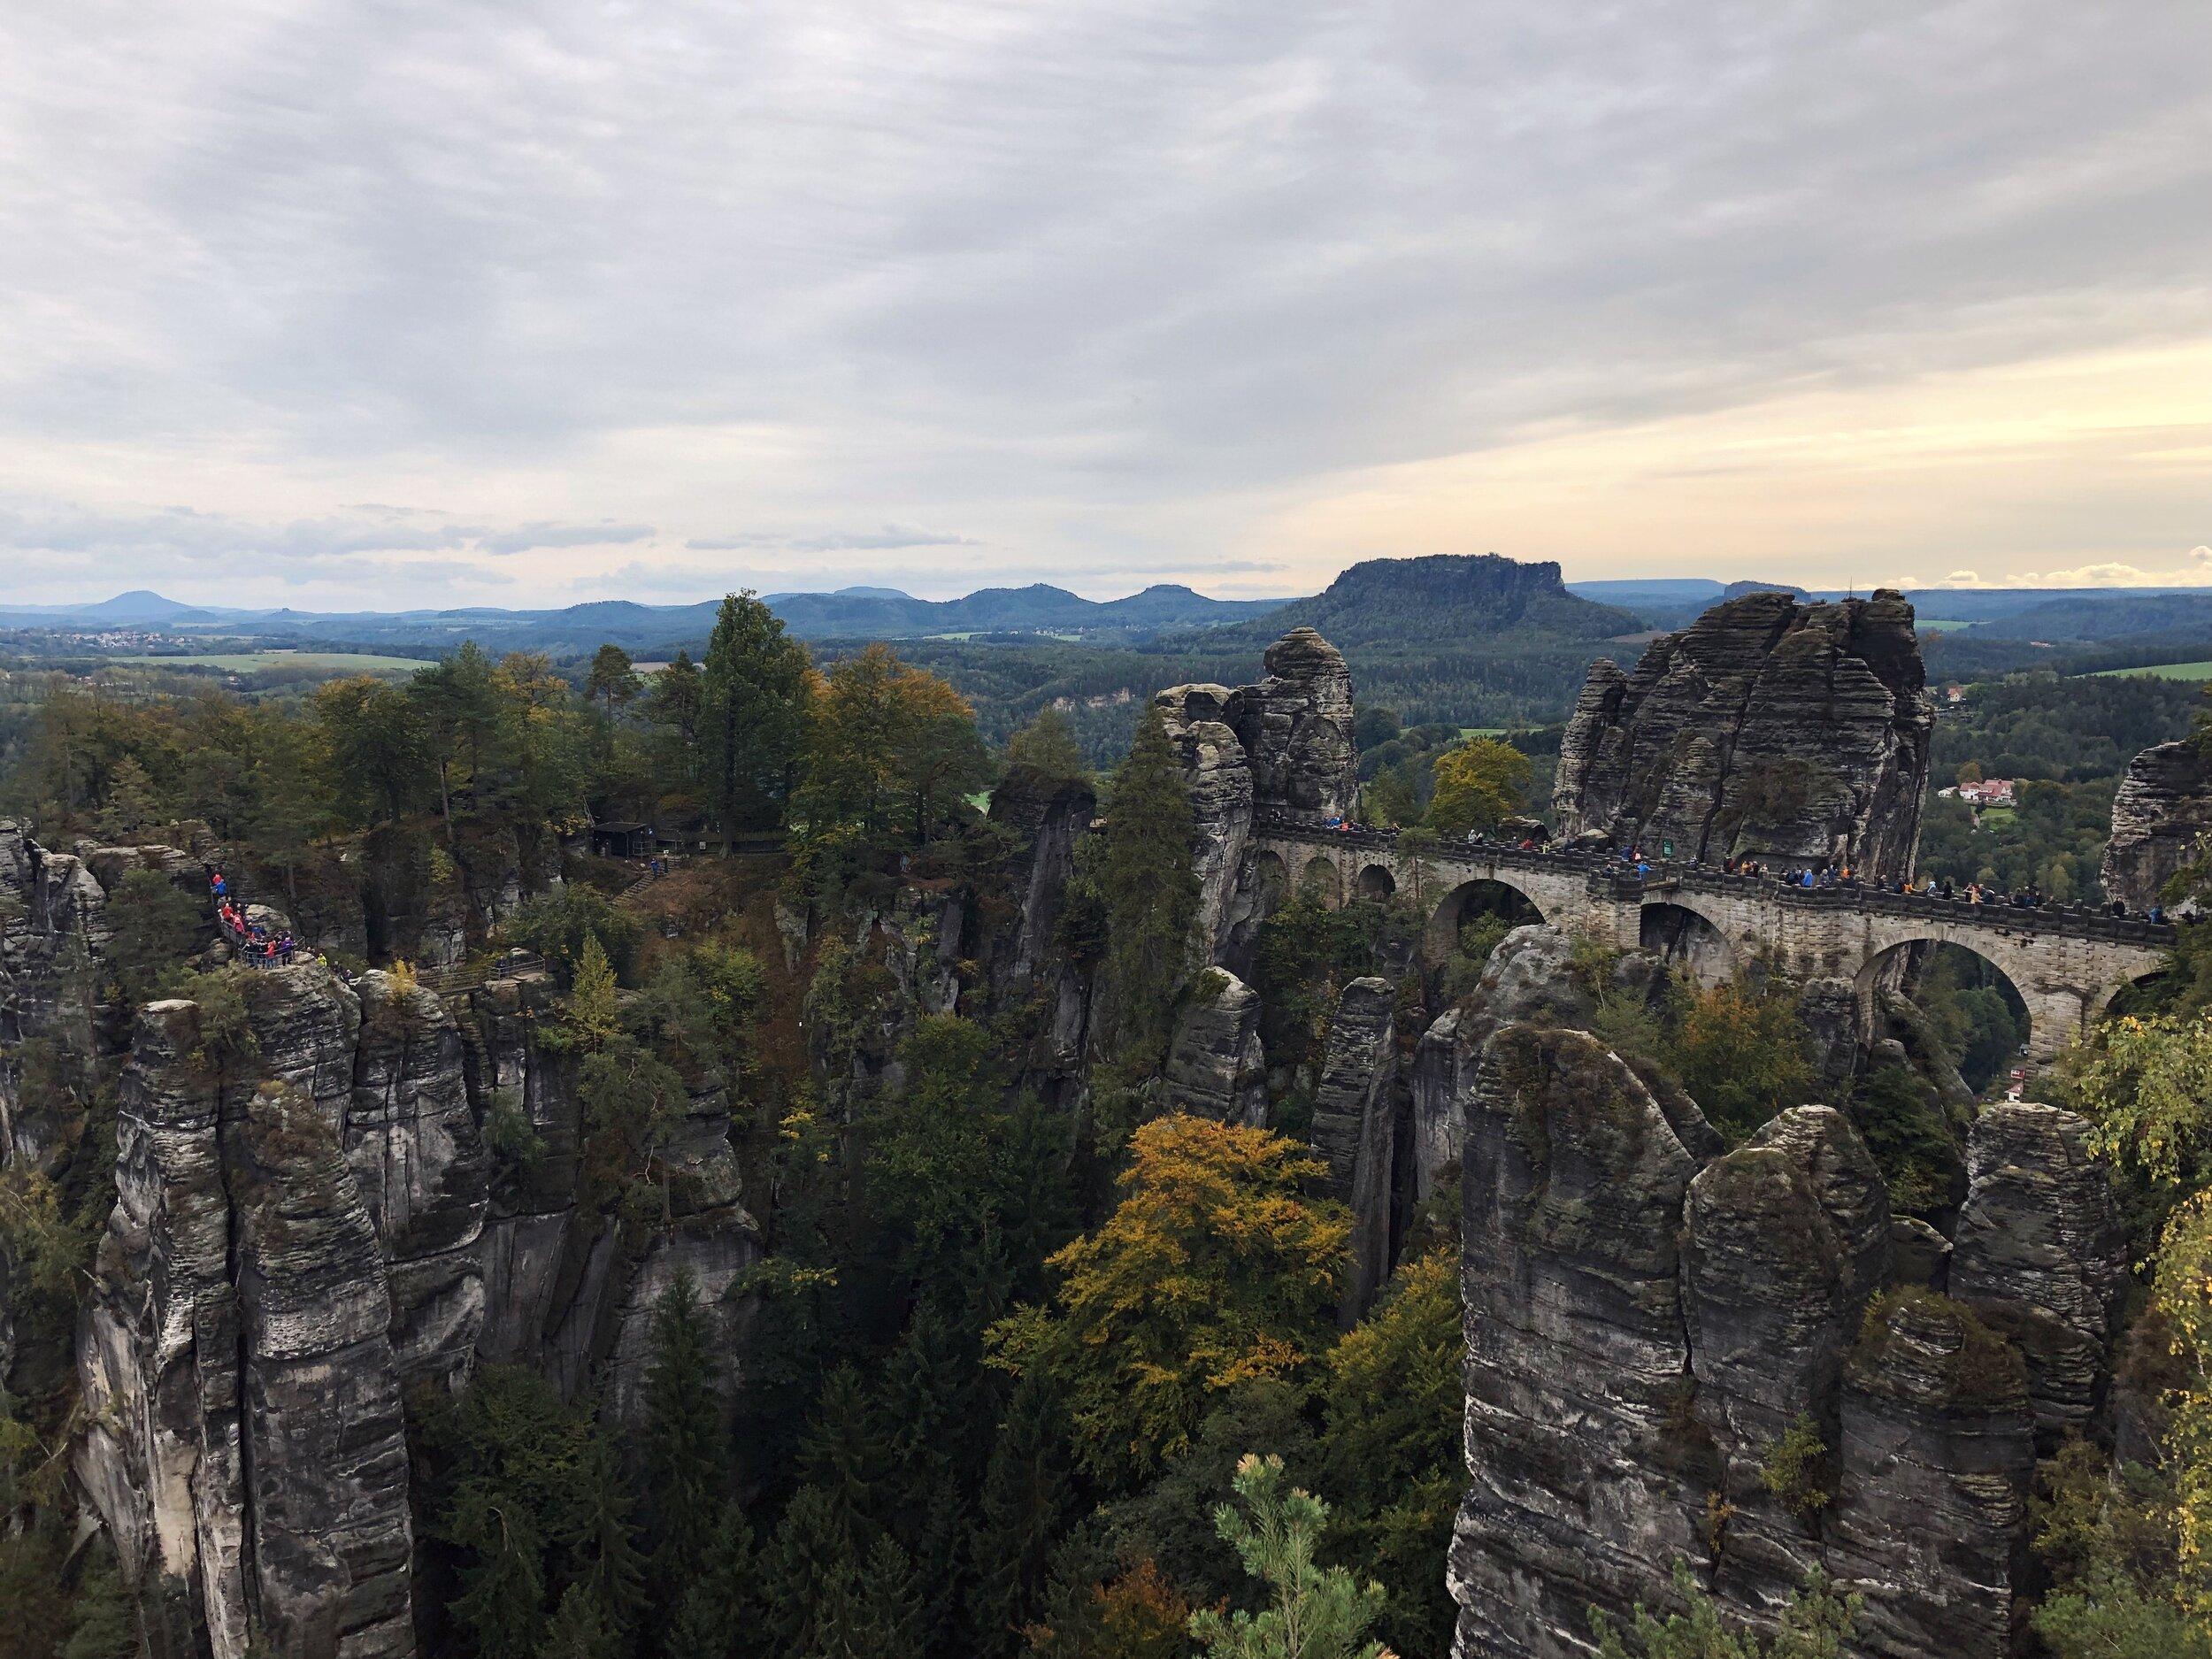 baste-bridge-lohmen-germany-hiking_0311.JPG